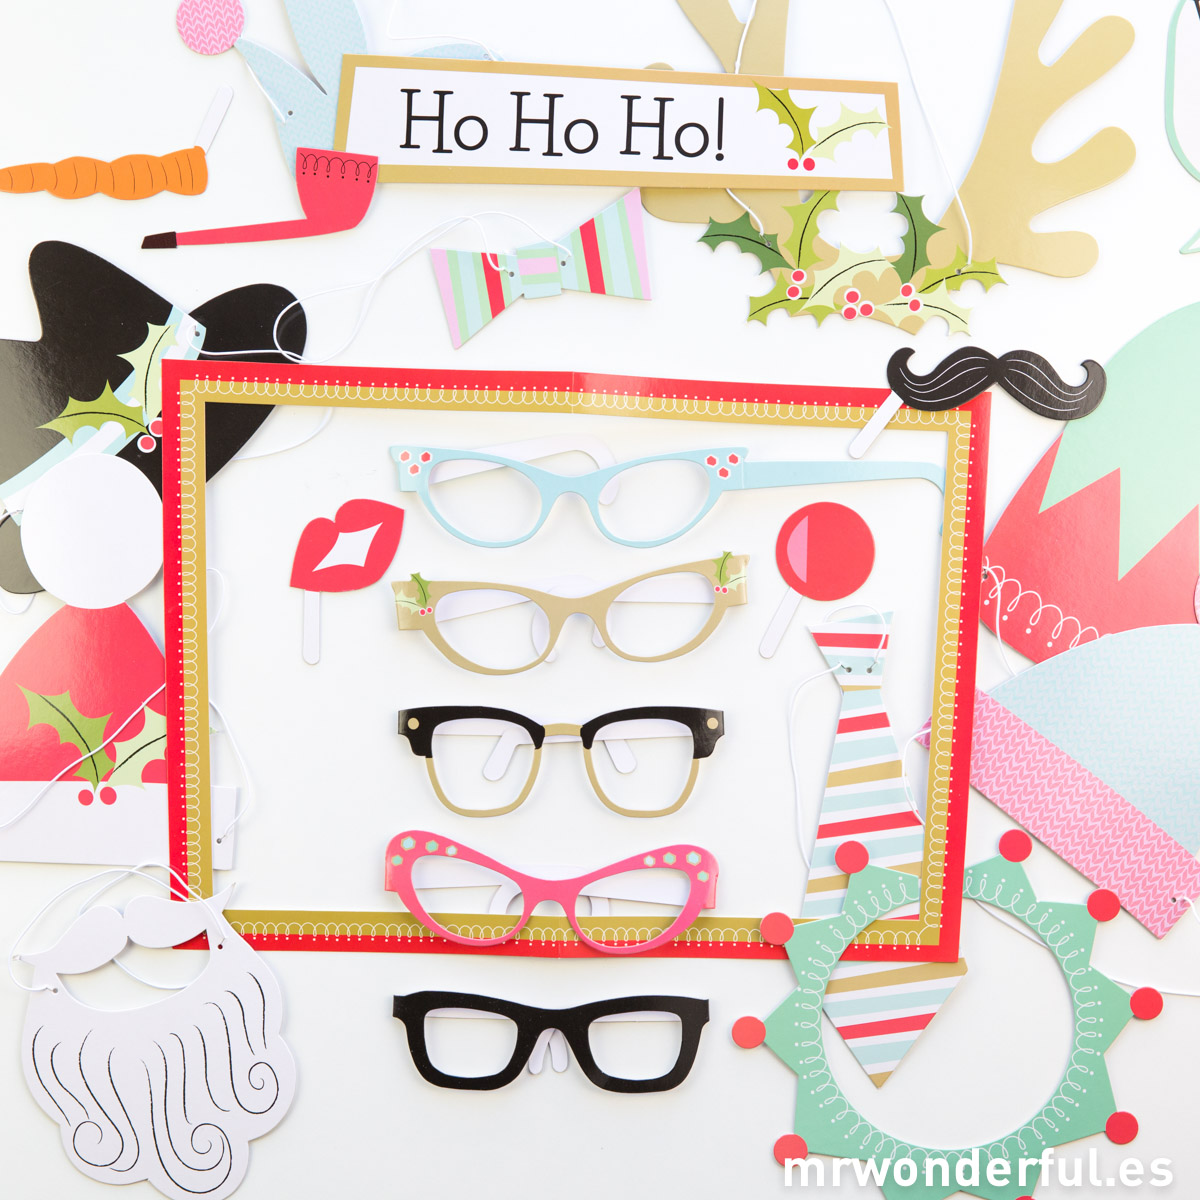 mrwonderful_CH-BOOTH-Phoo-booth-navideño-1